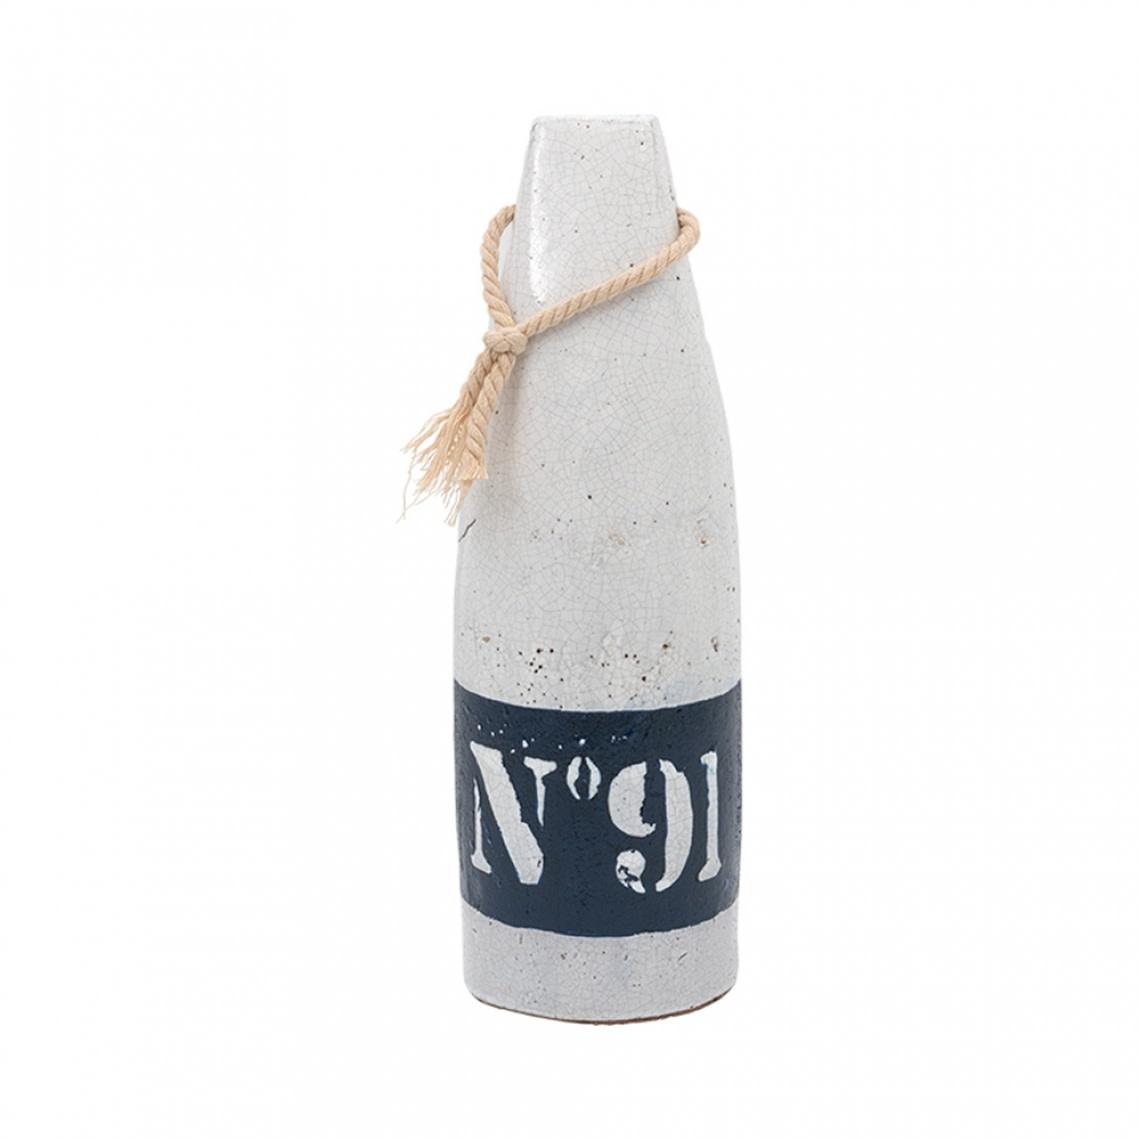 Ceramic Buoy White and Blue #91